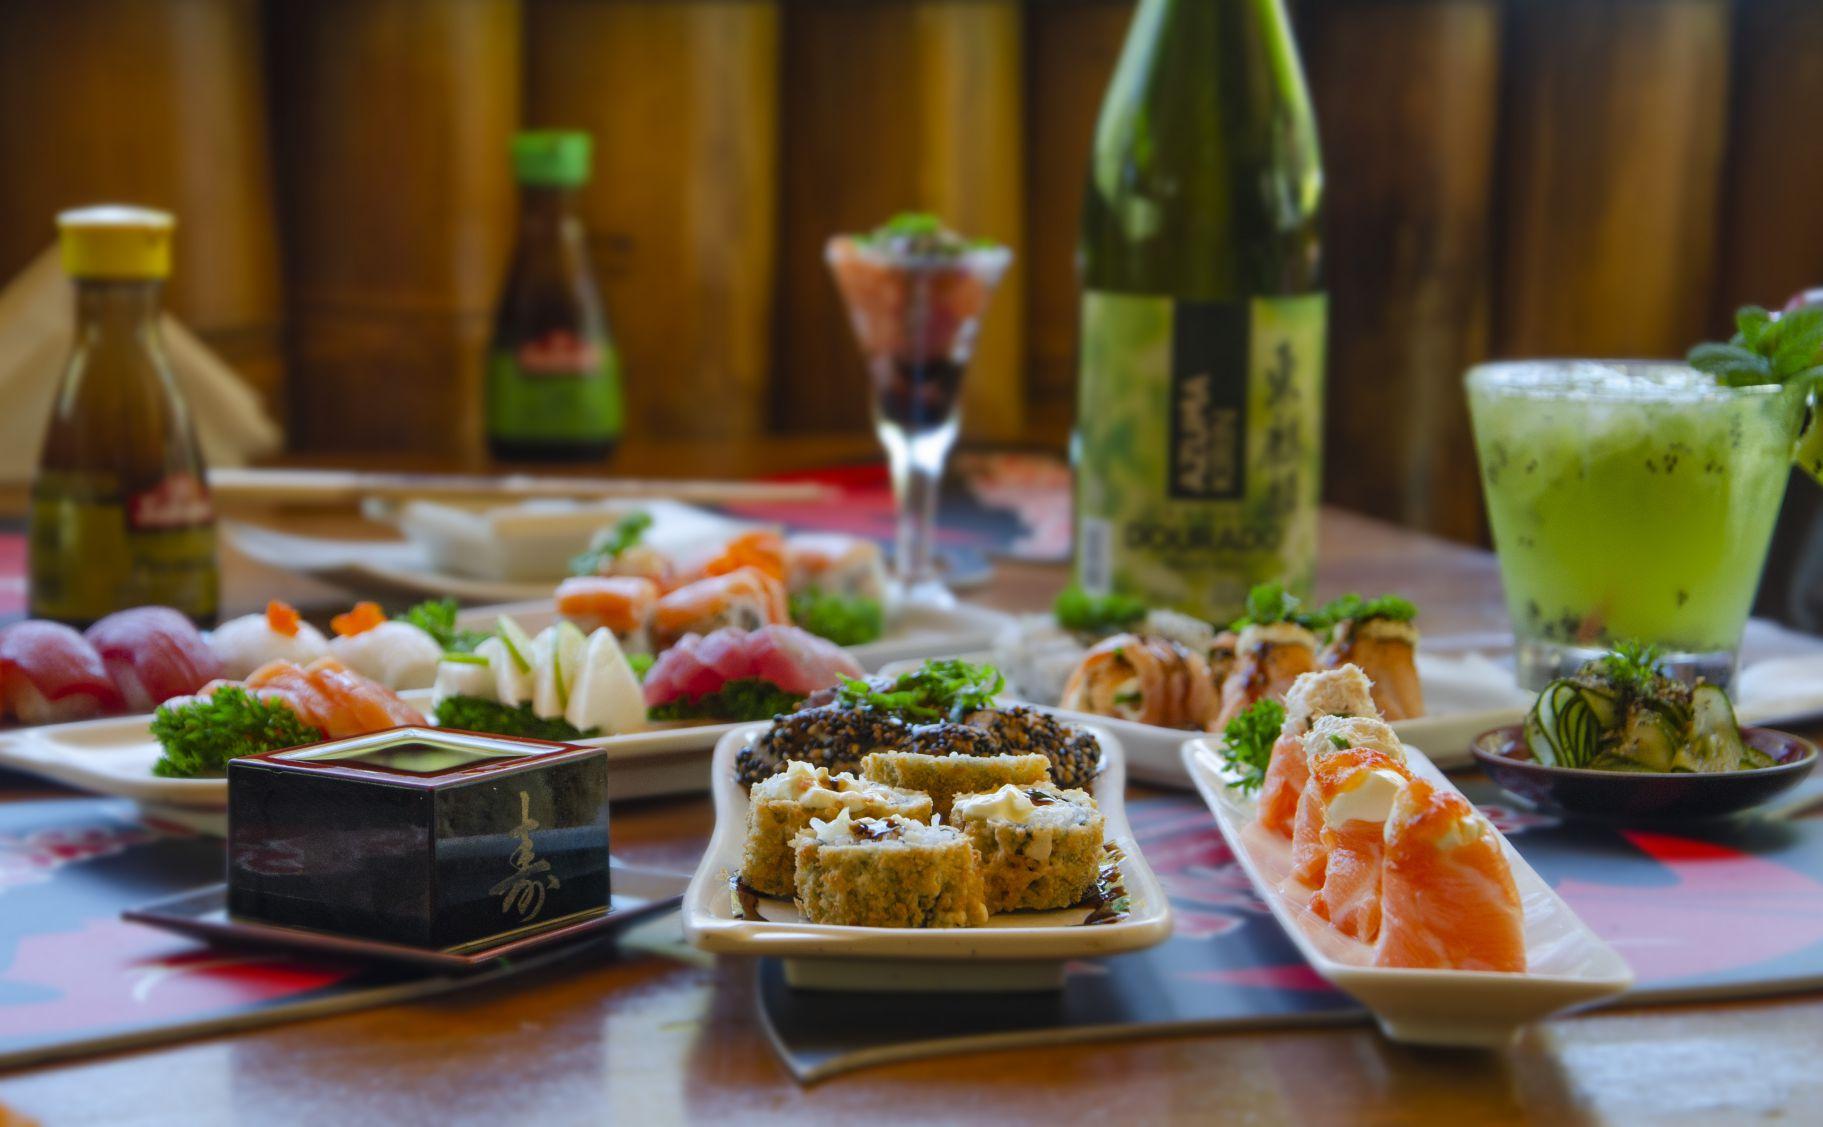 Yamazaki Sushi